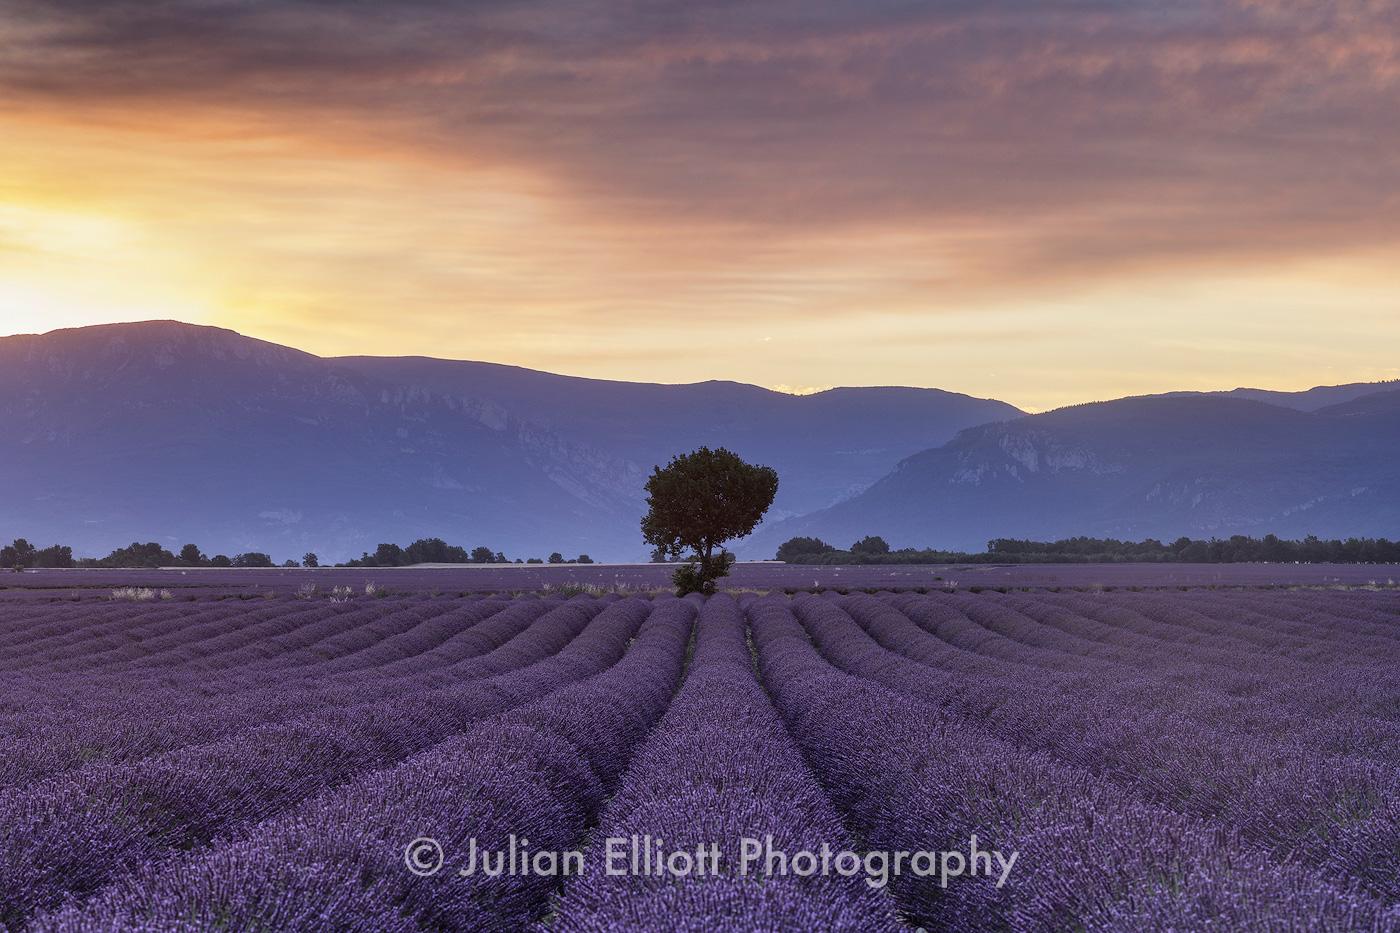 Lavender fields on the Plateau de Valensole, Provence.